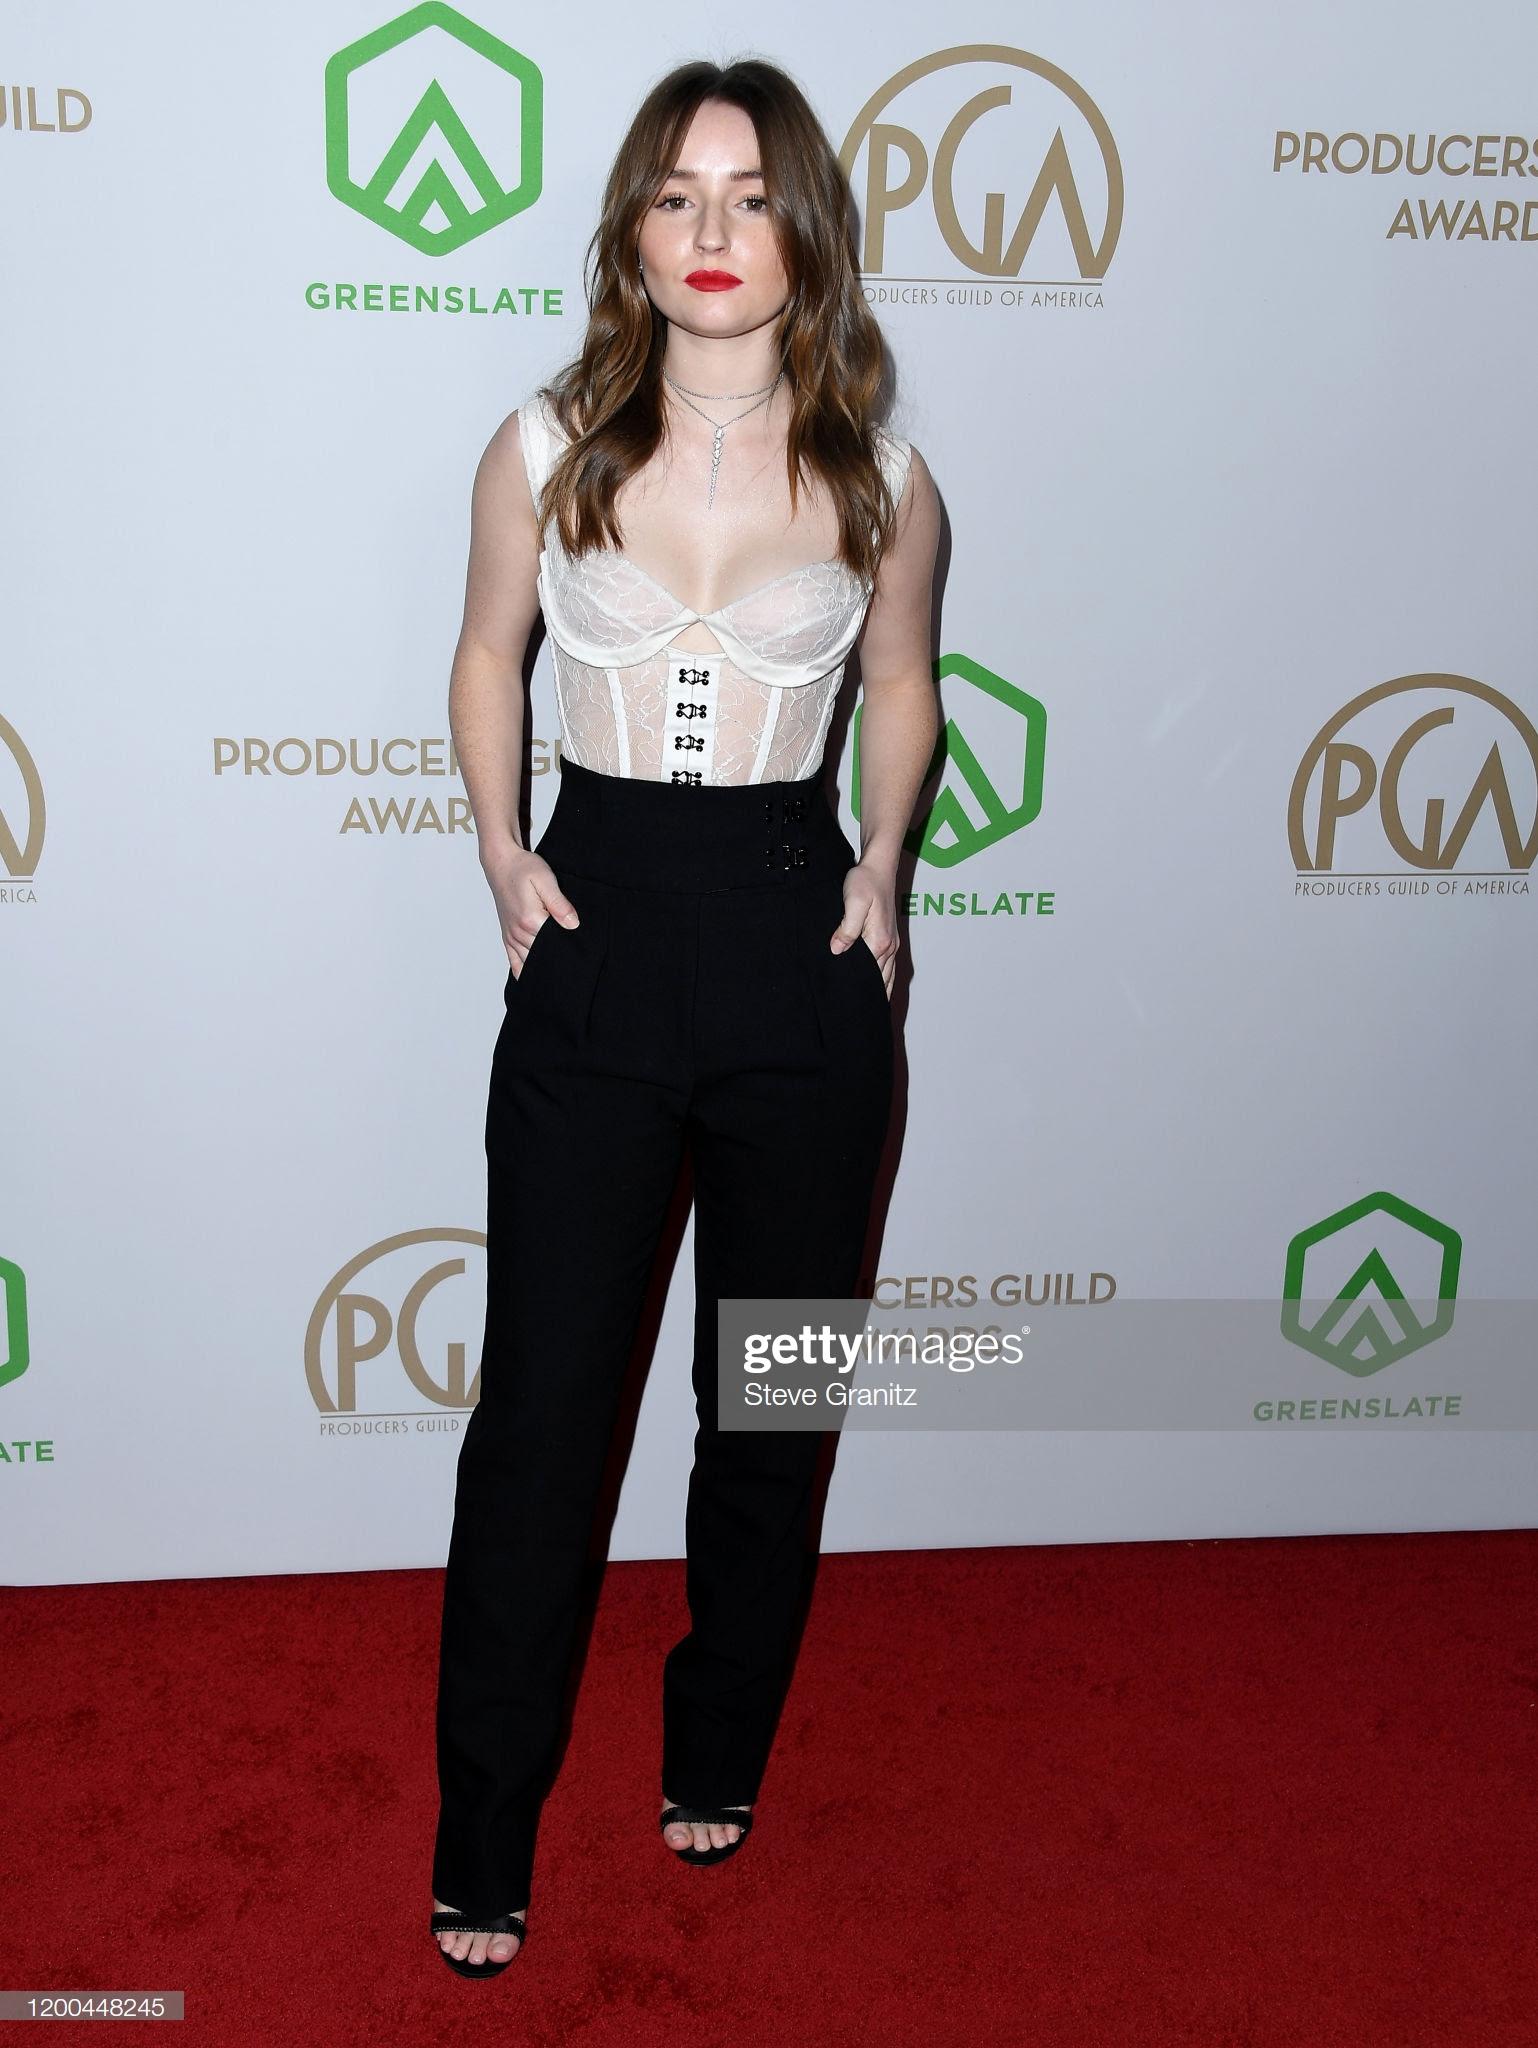 "ec5f97c0 73d4 4652 905d b0e71b0bcc27 - Screen Actors Guild Awards"" 2020: Scarlett Johansson y Leonardo Dicaprio entre las celebrities que lucieron Jimmy Choo"